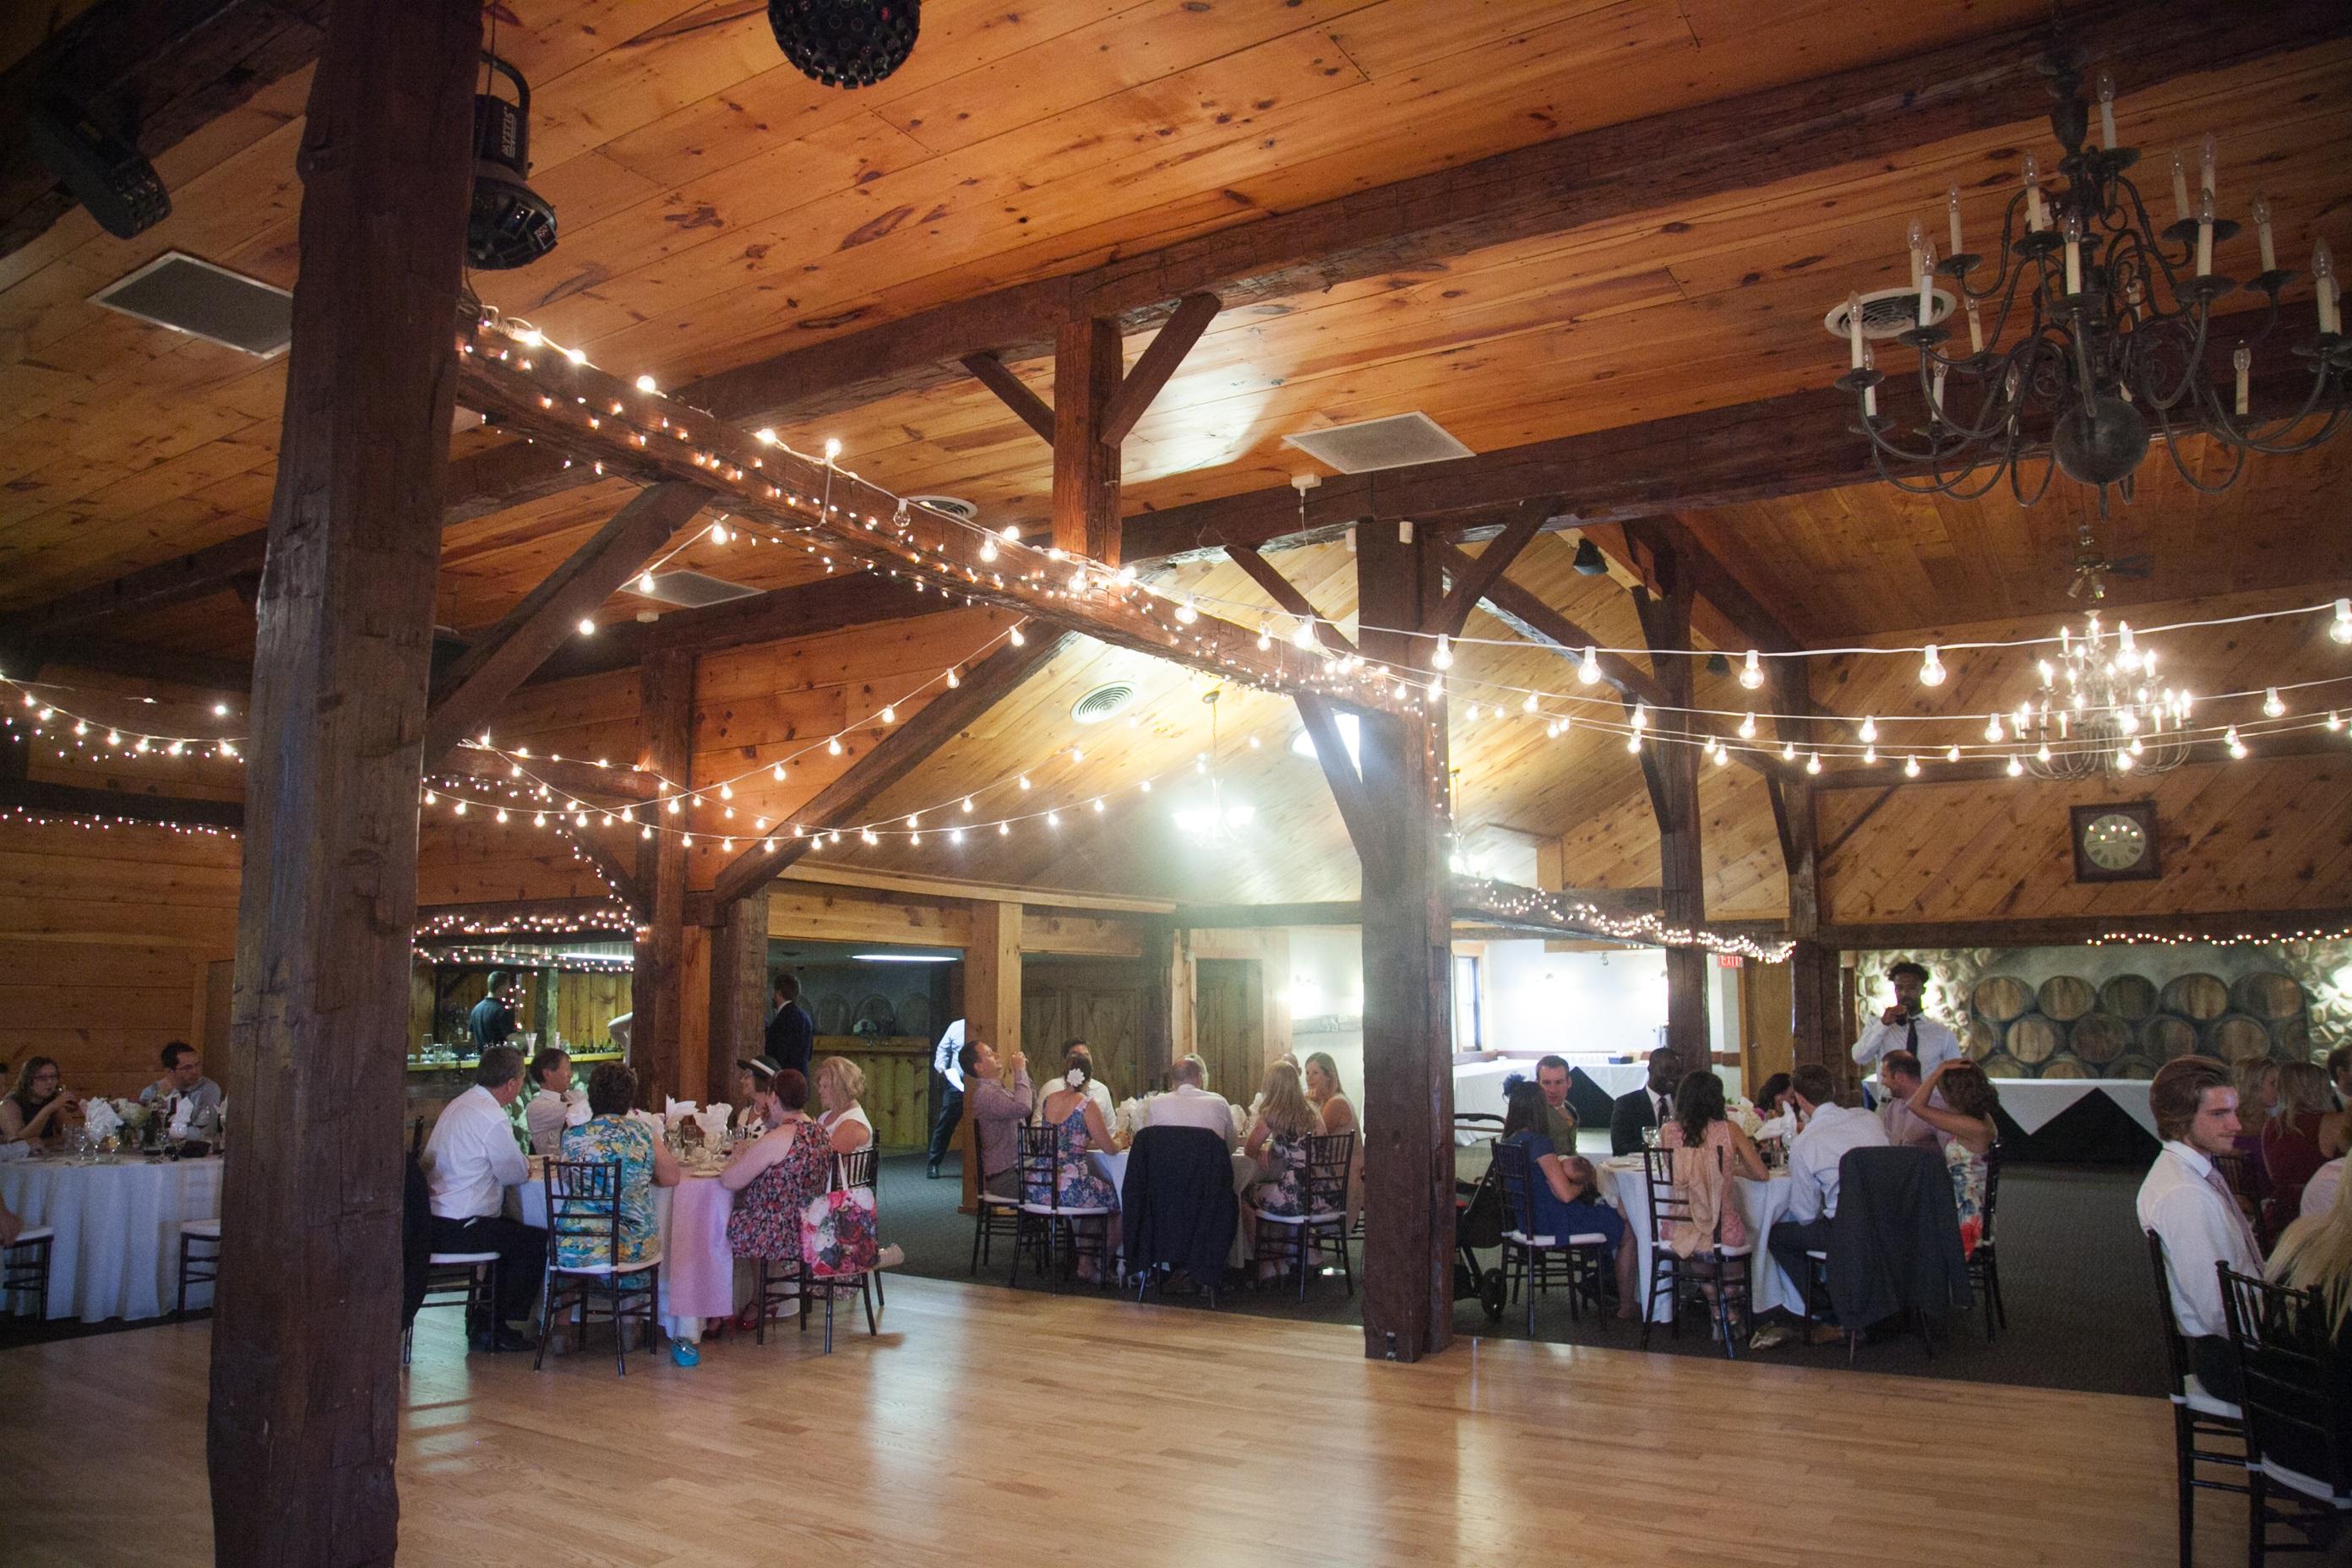 wedding decor - head table  lighting